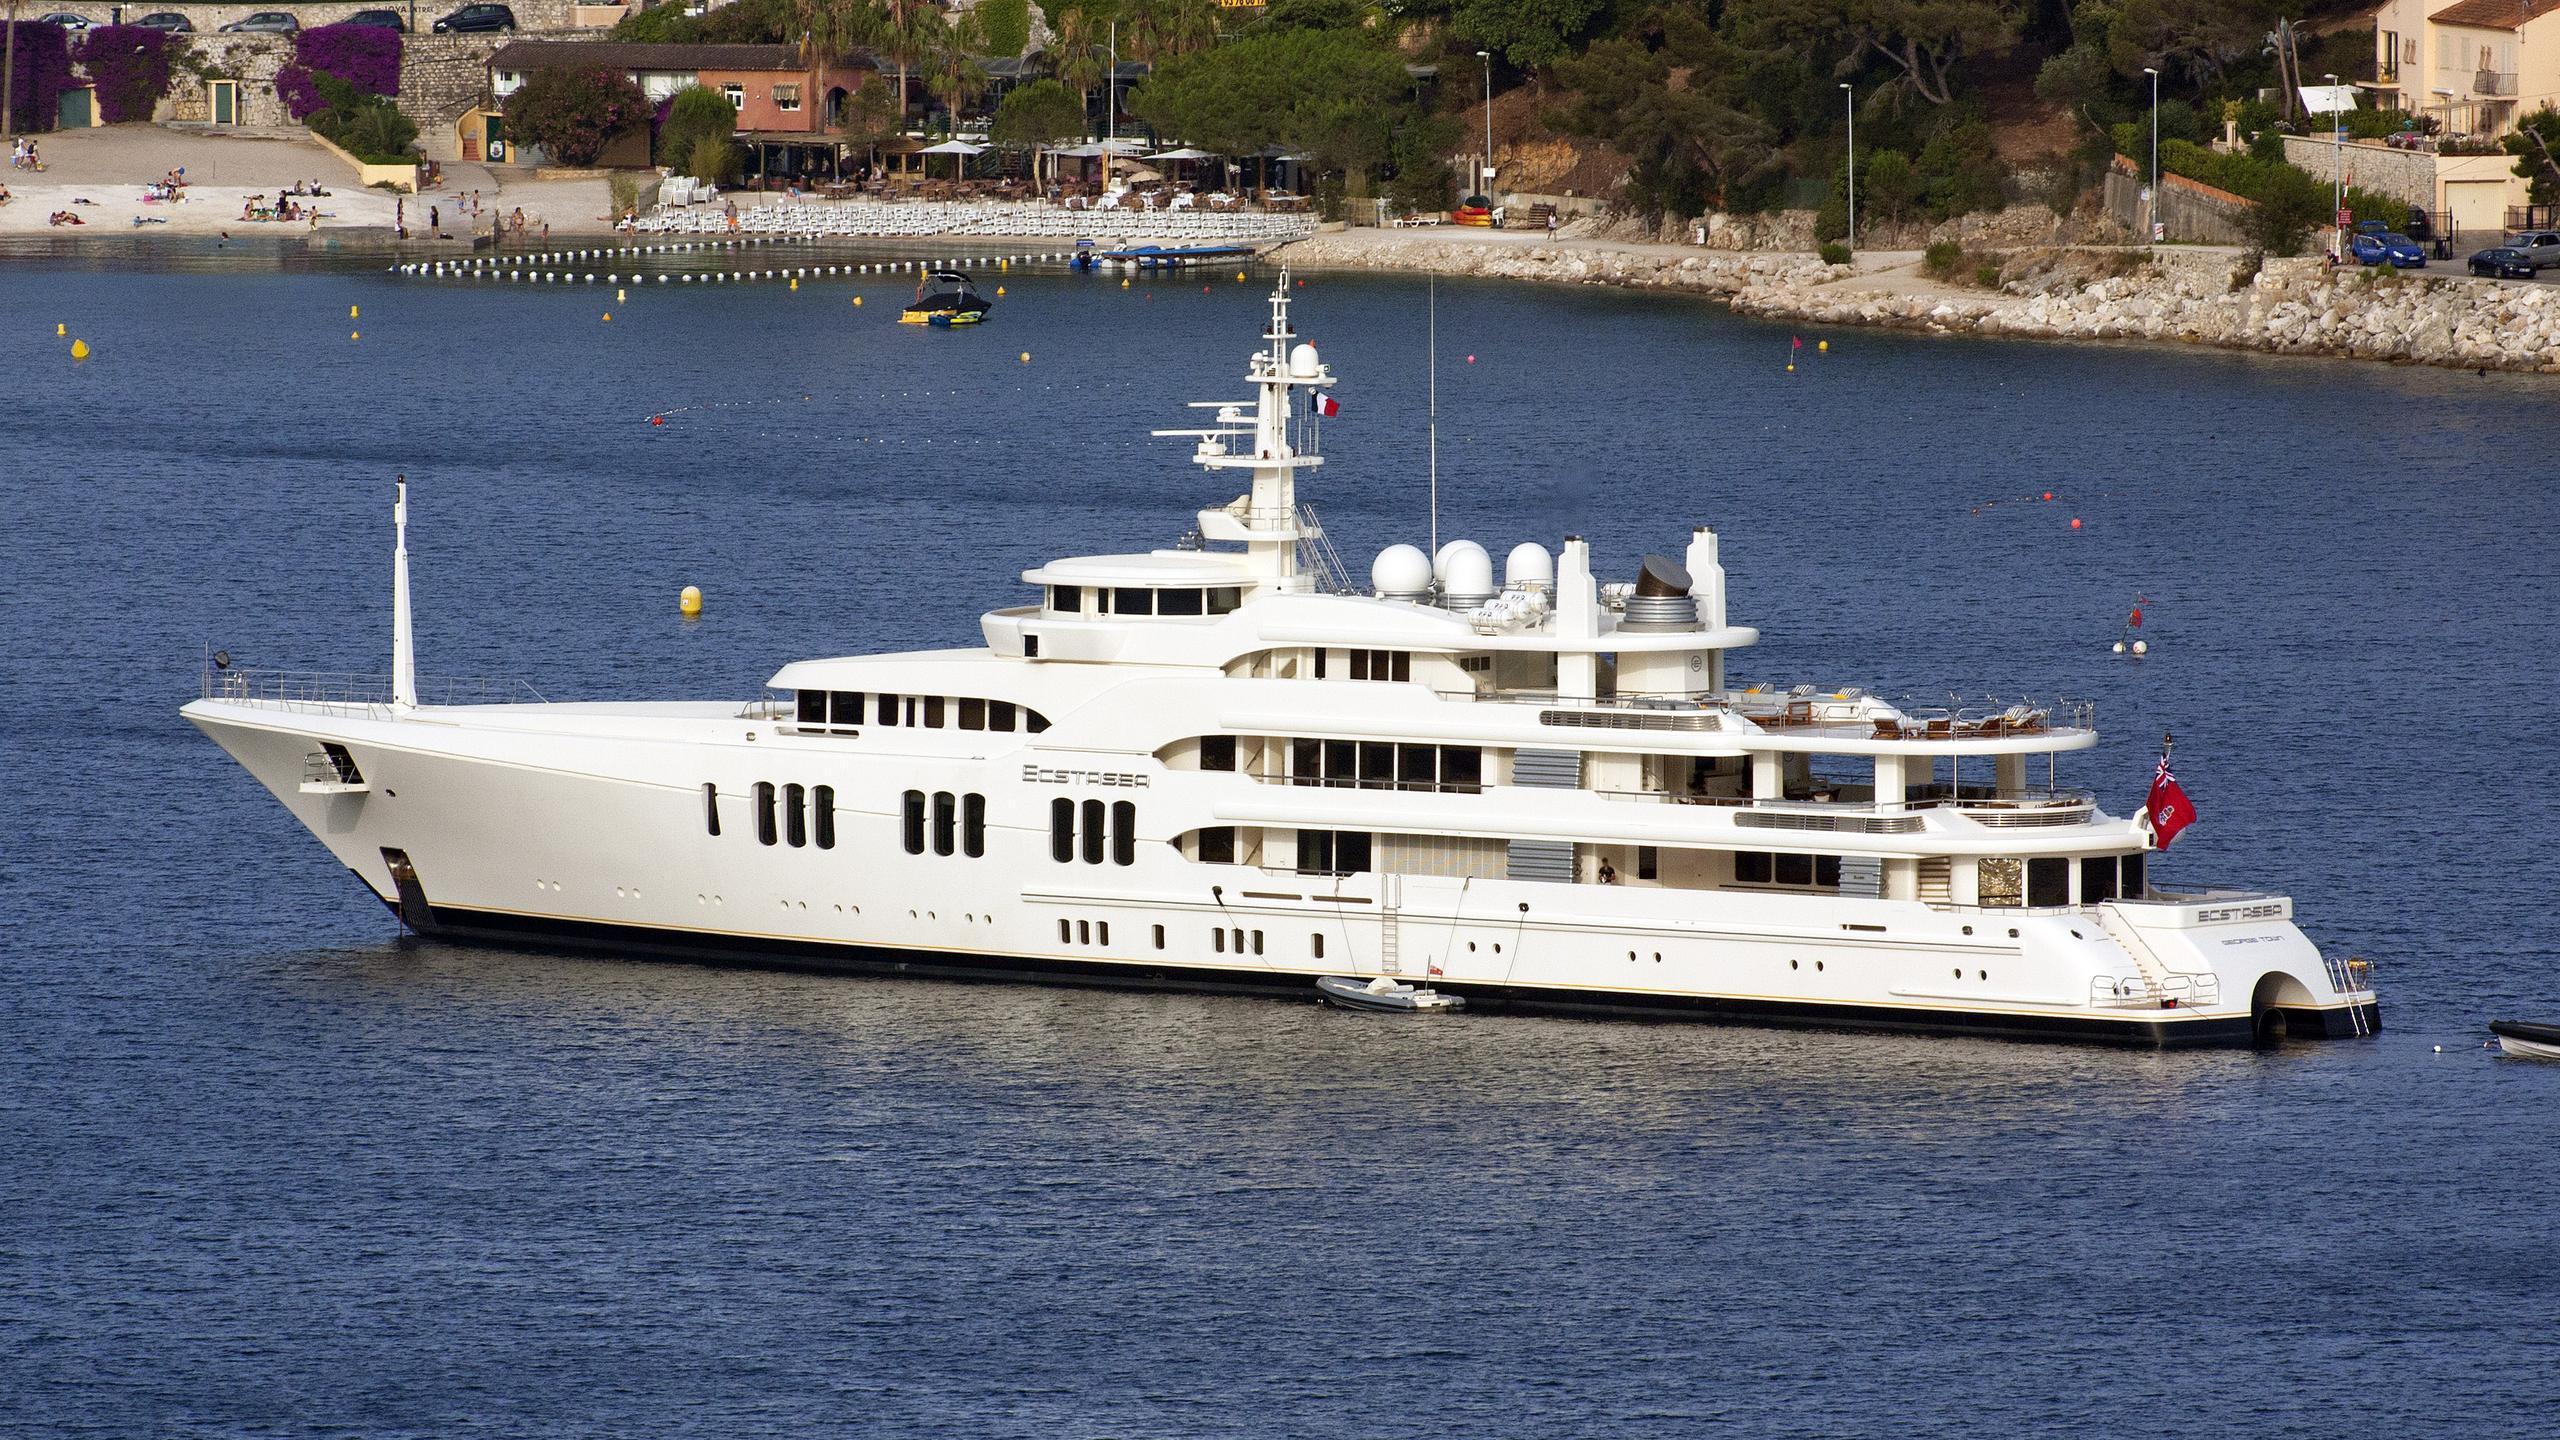 ecstasea-motor-yacht-feadship-2004-86m-profile